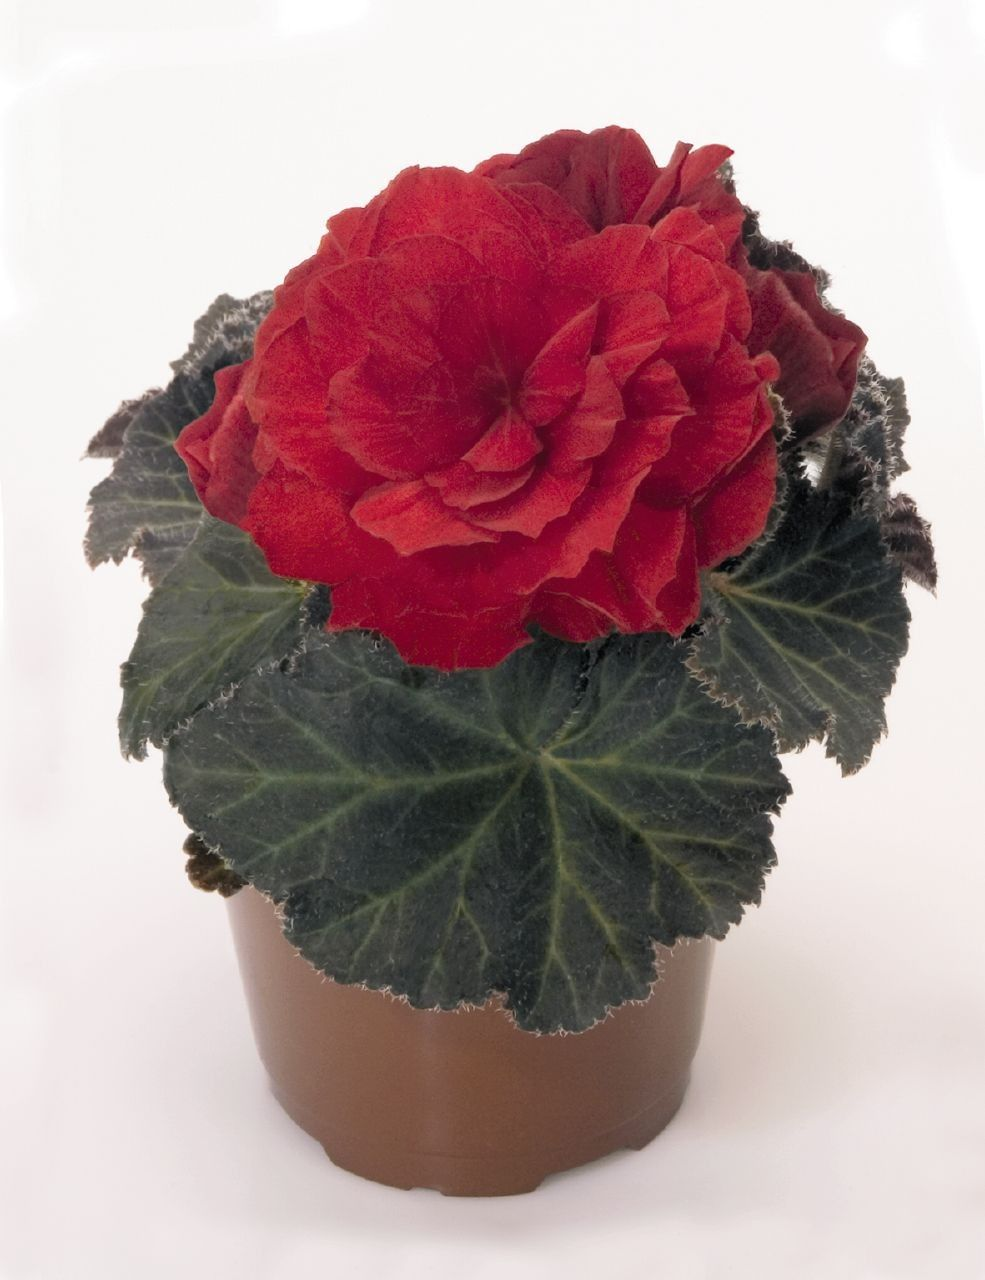 Begonia tuberhybrida 'Nonstop Mocca Scarlet' G-9